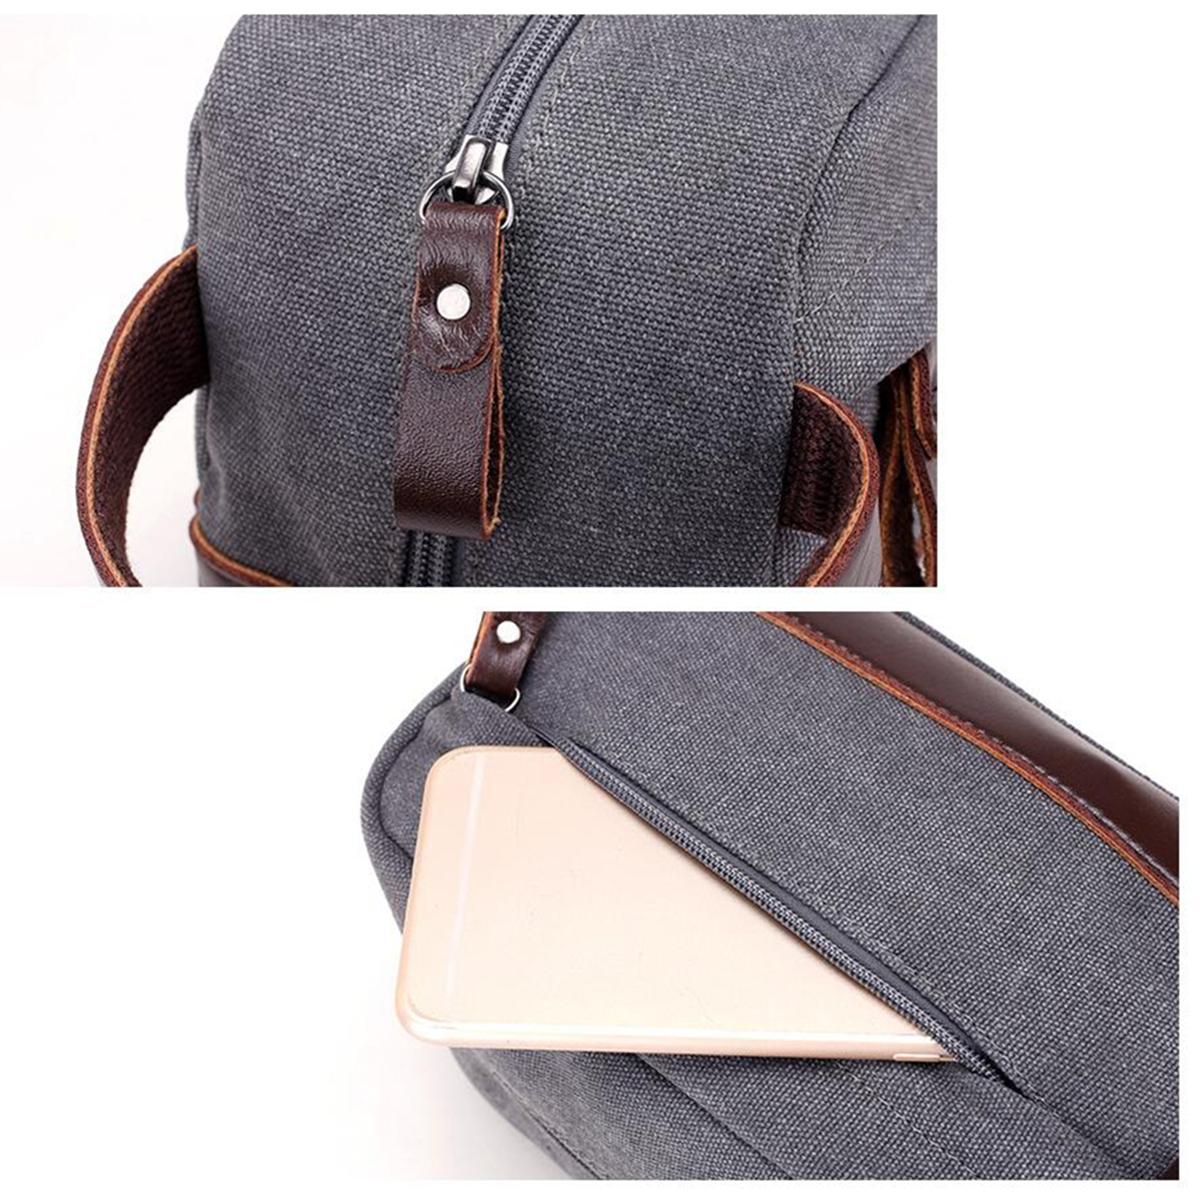 Men Travel Clutch Handbag Portable Carrying Phone Pouch Casual Canvas Wrist Bag